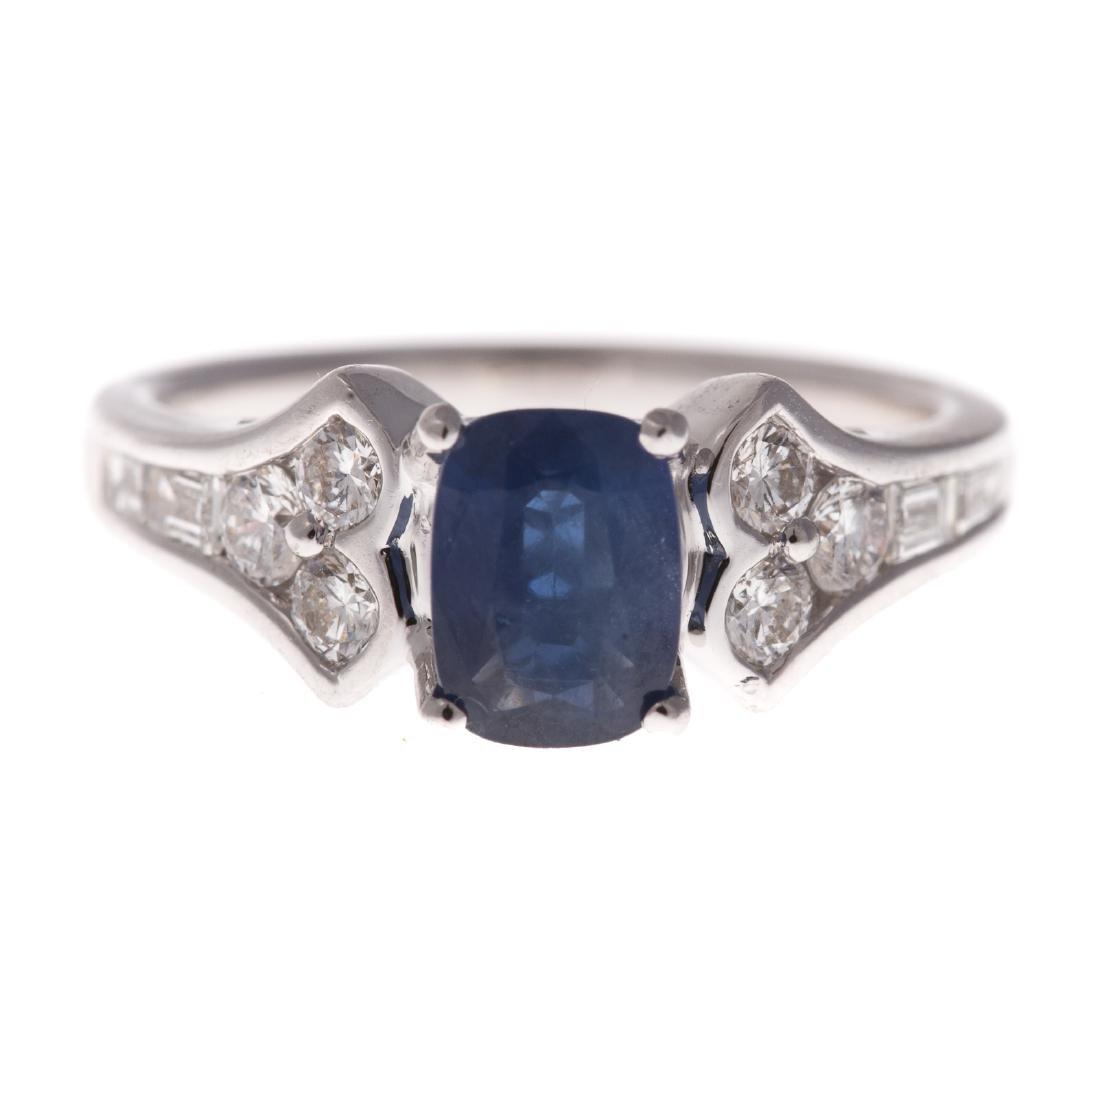 A Lady's 18K Sapphire & Diamond Ring